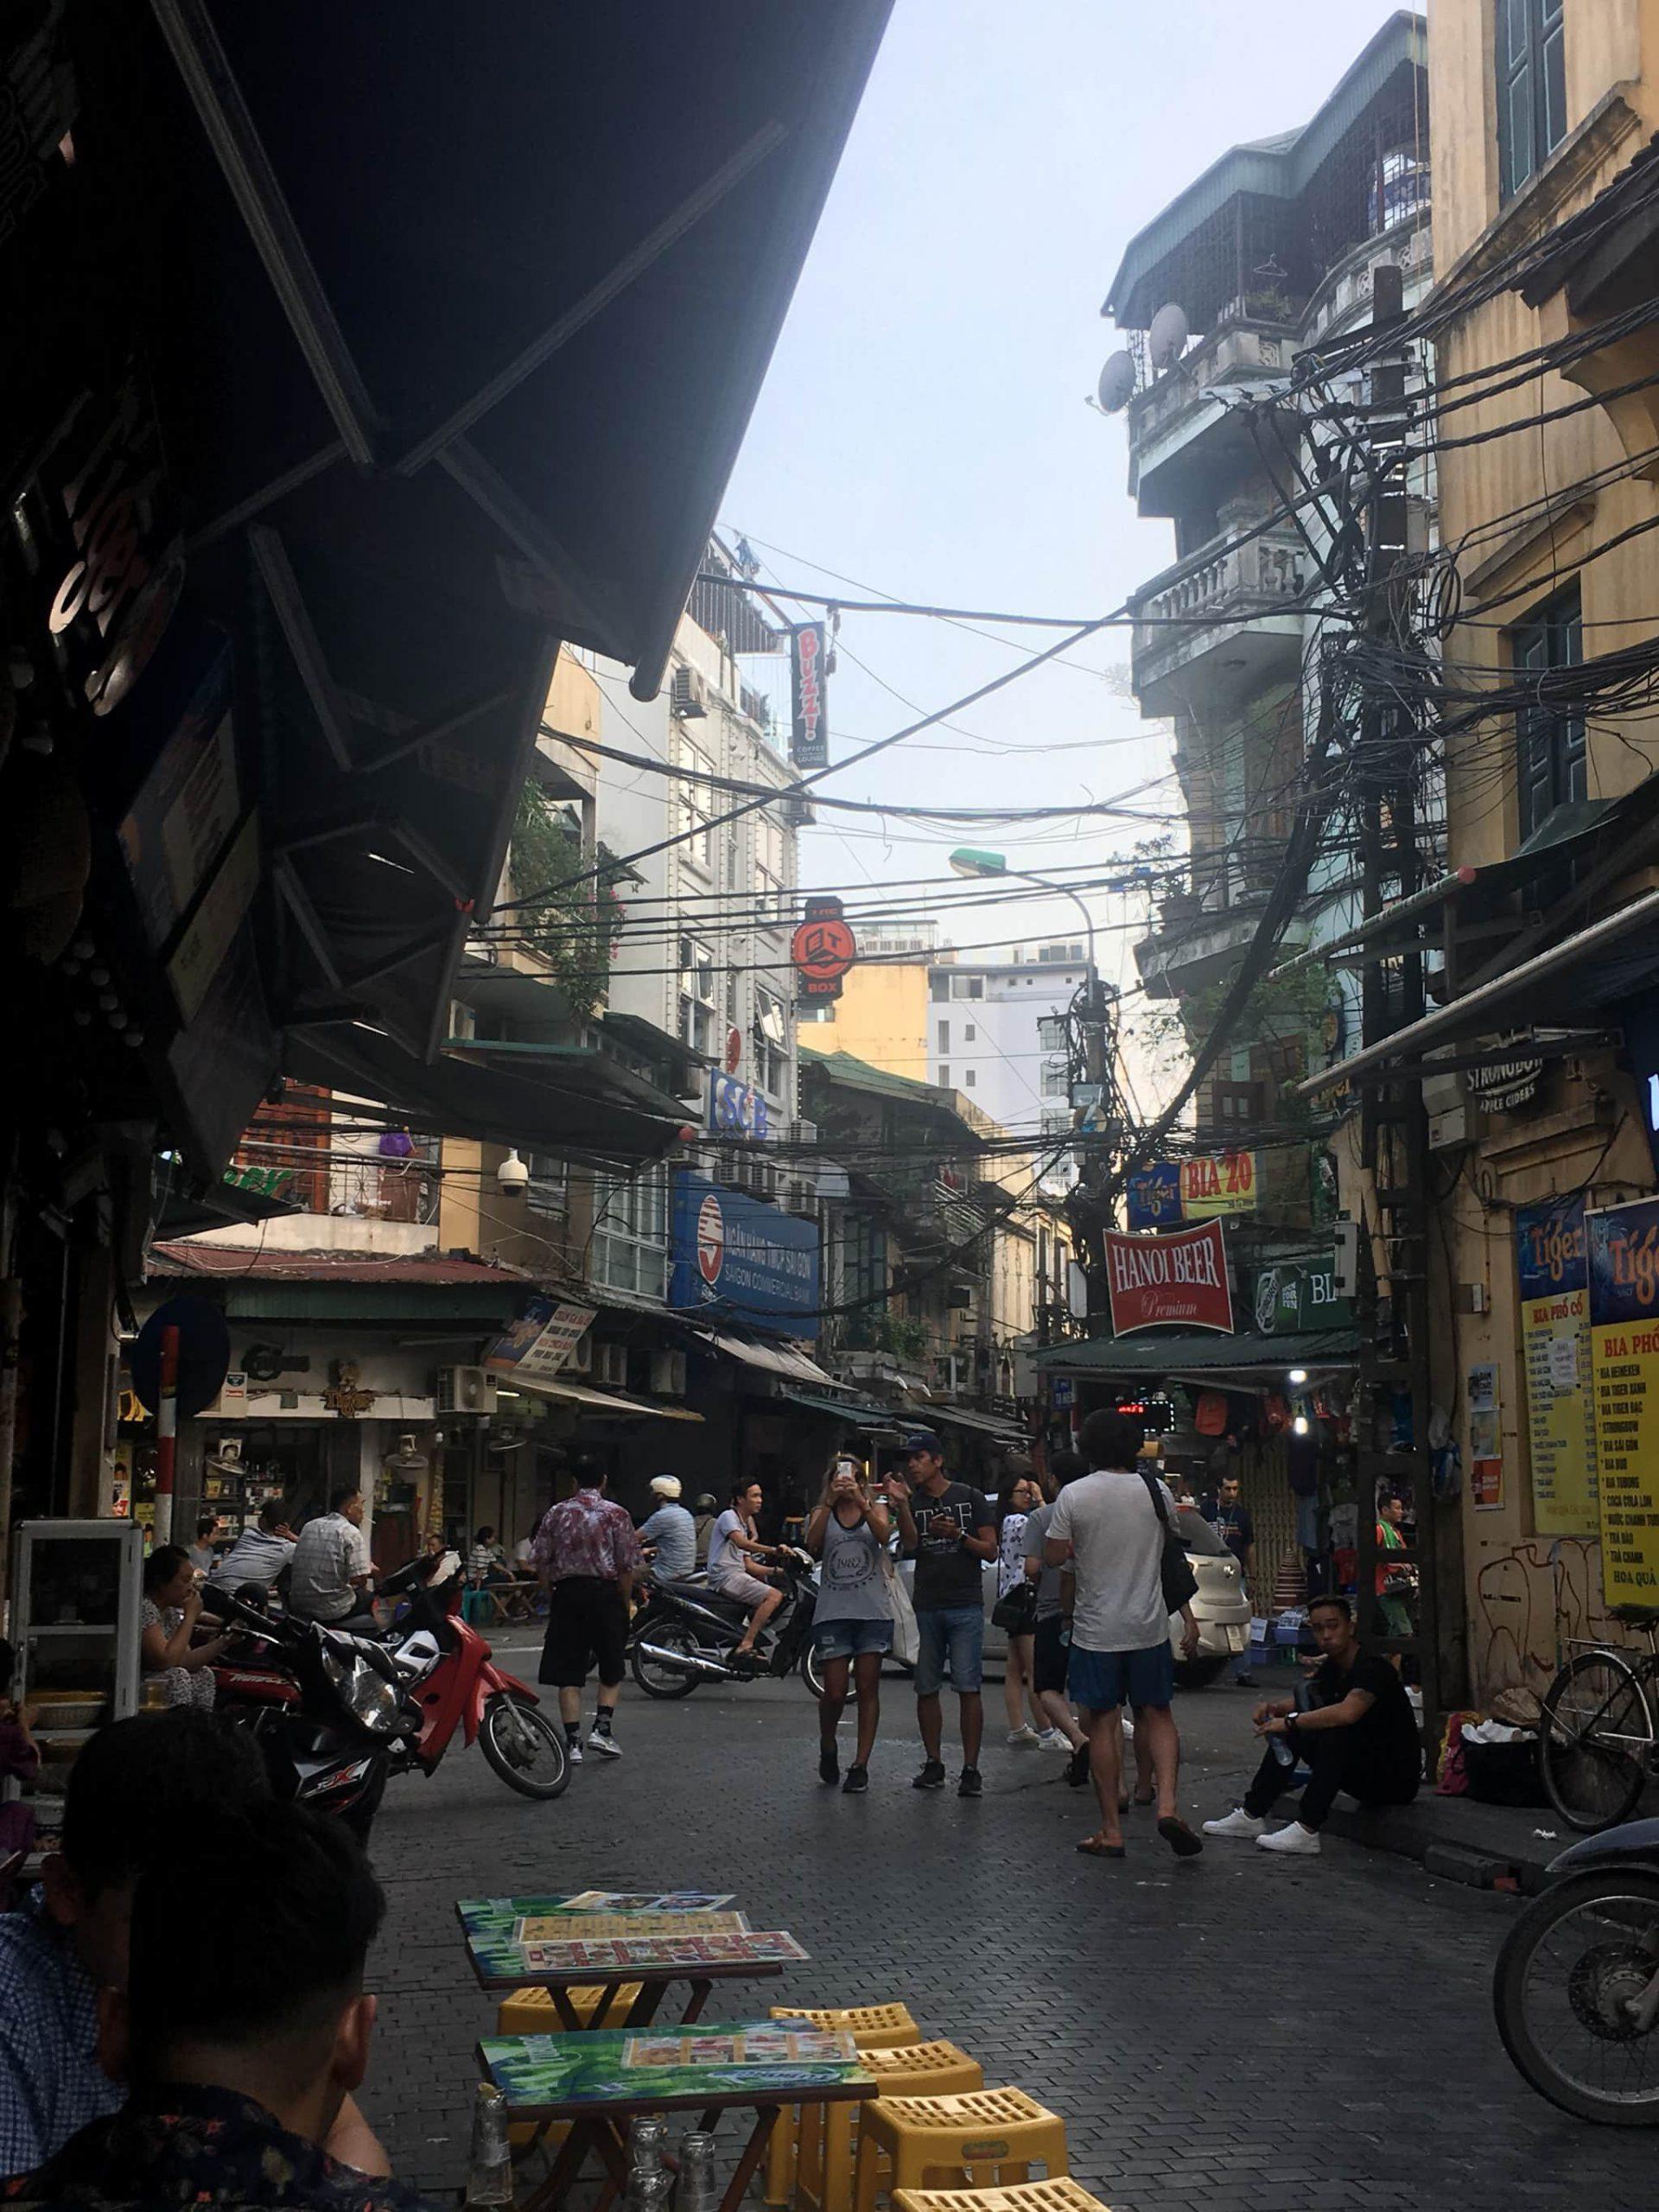 IMG 0759 e1538296187894 - Digital Nomad maand 12: Nederland & Vietnam | September 2018